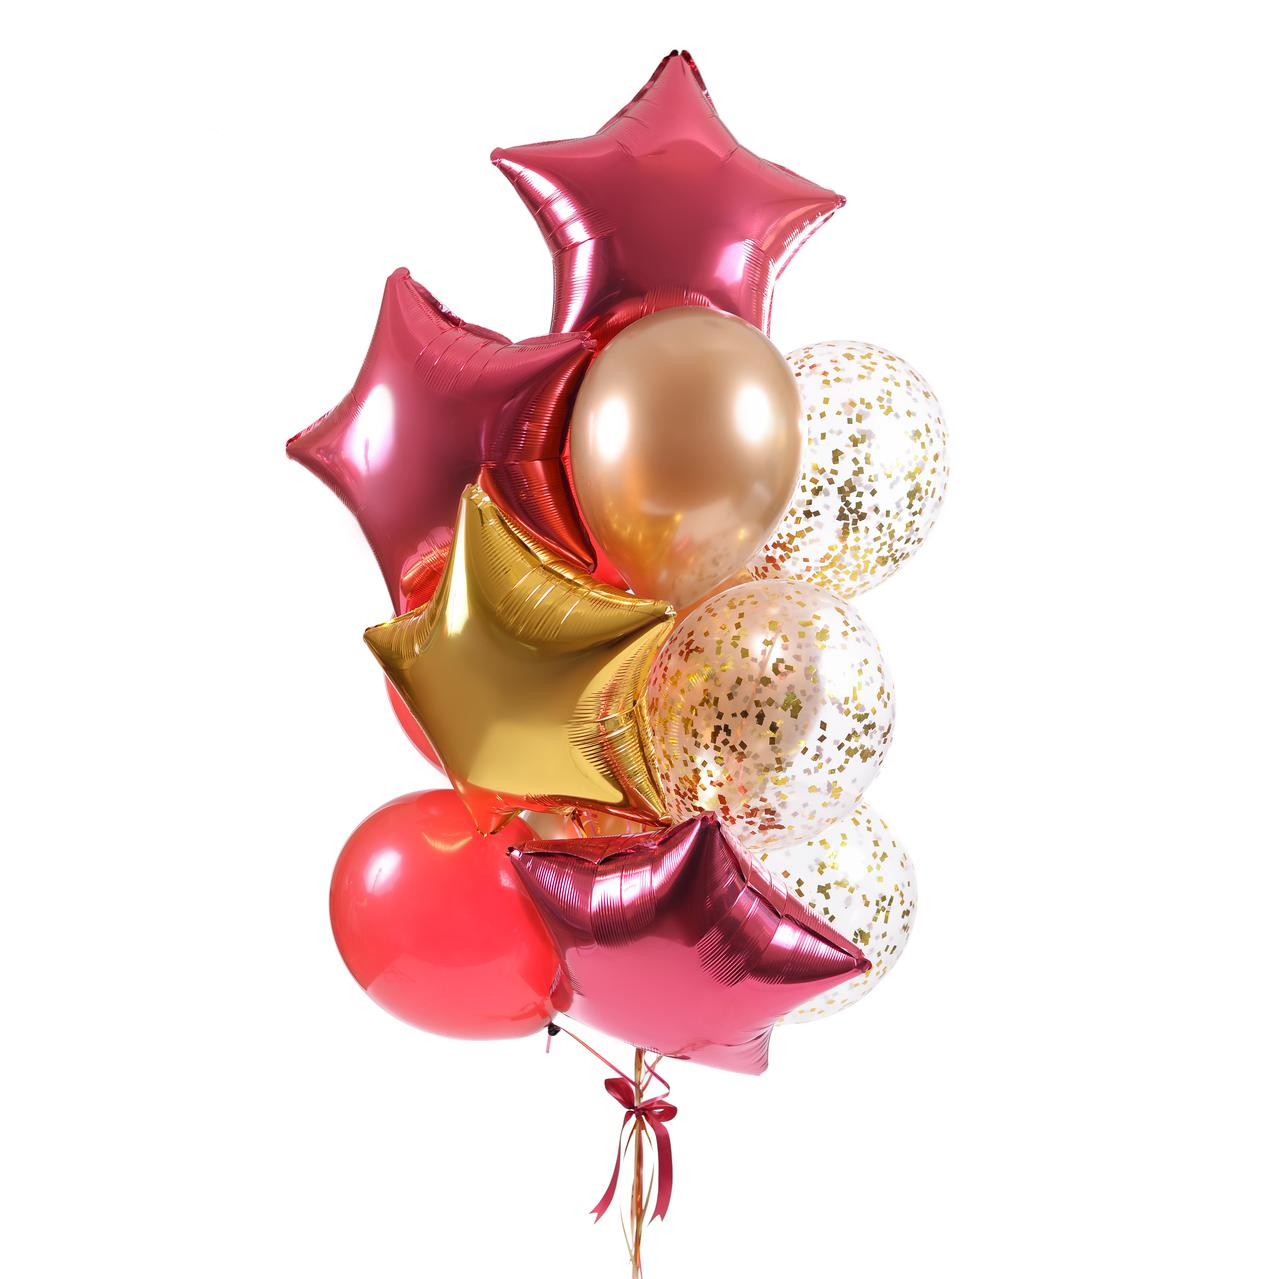 3 звезды бургундия, 1 звезда золото, 3 шара бургундия кристалл, 3 шара золото хром, 3 шара с золотым конфетти.